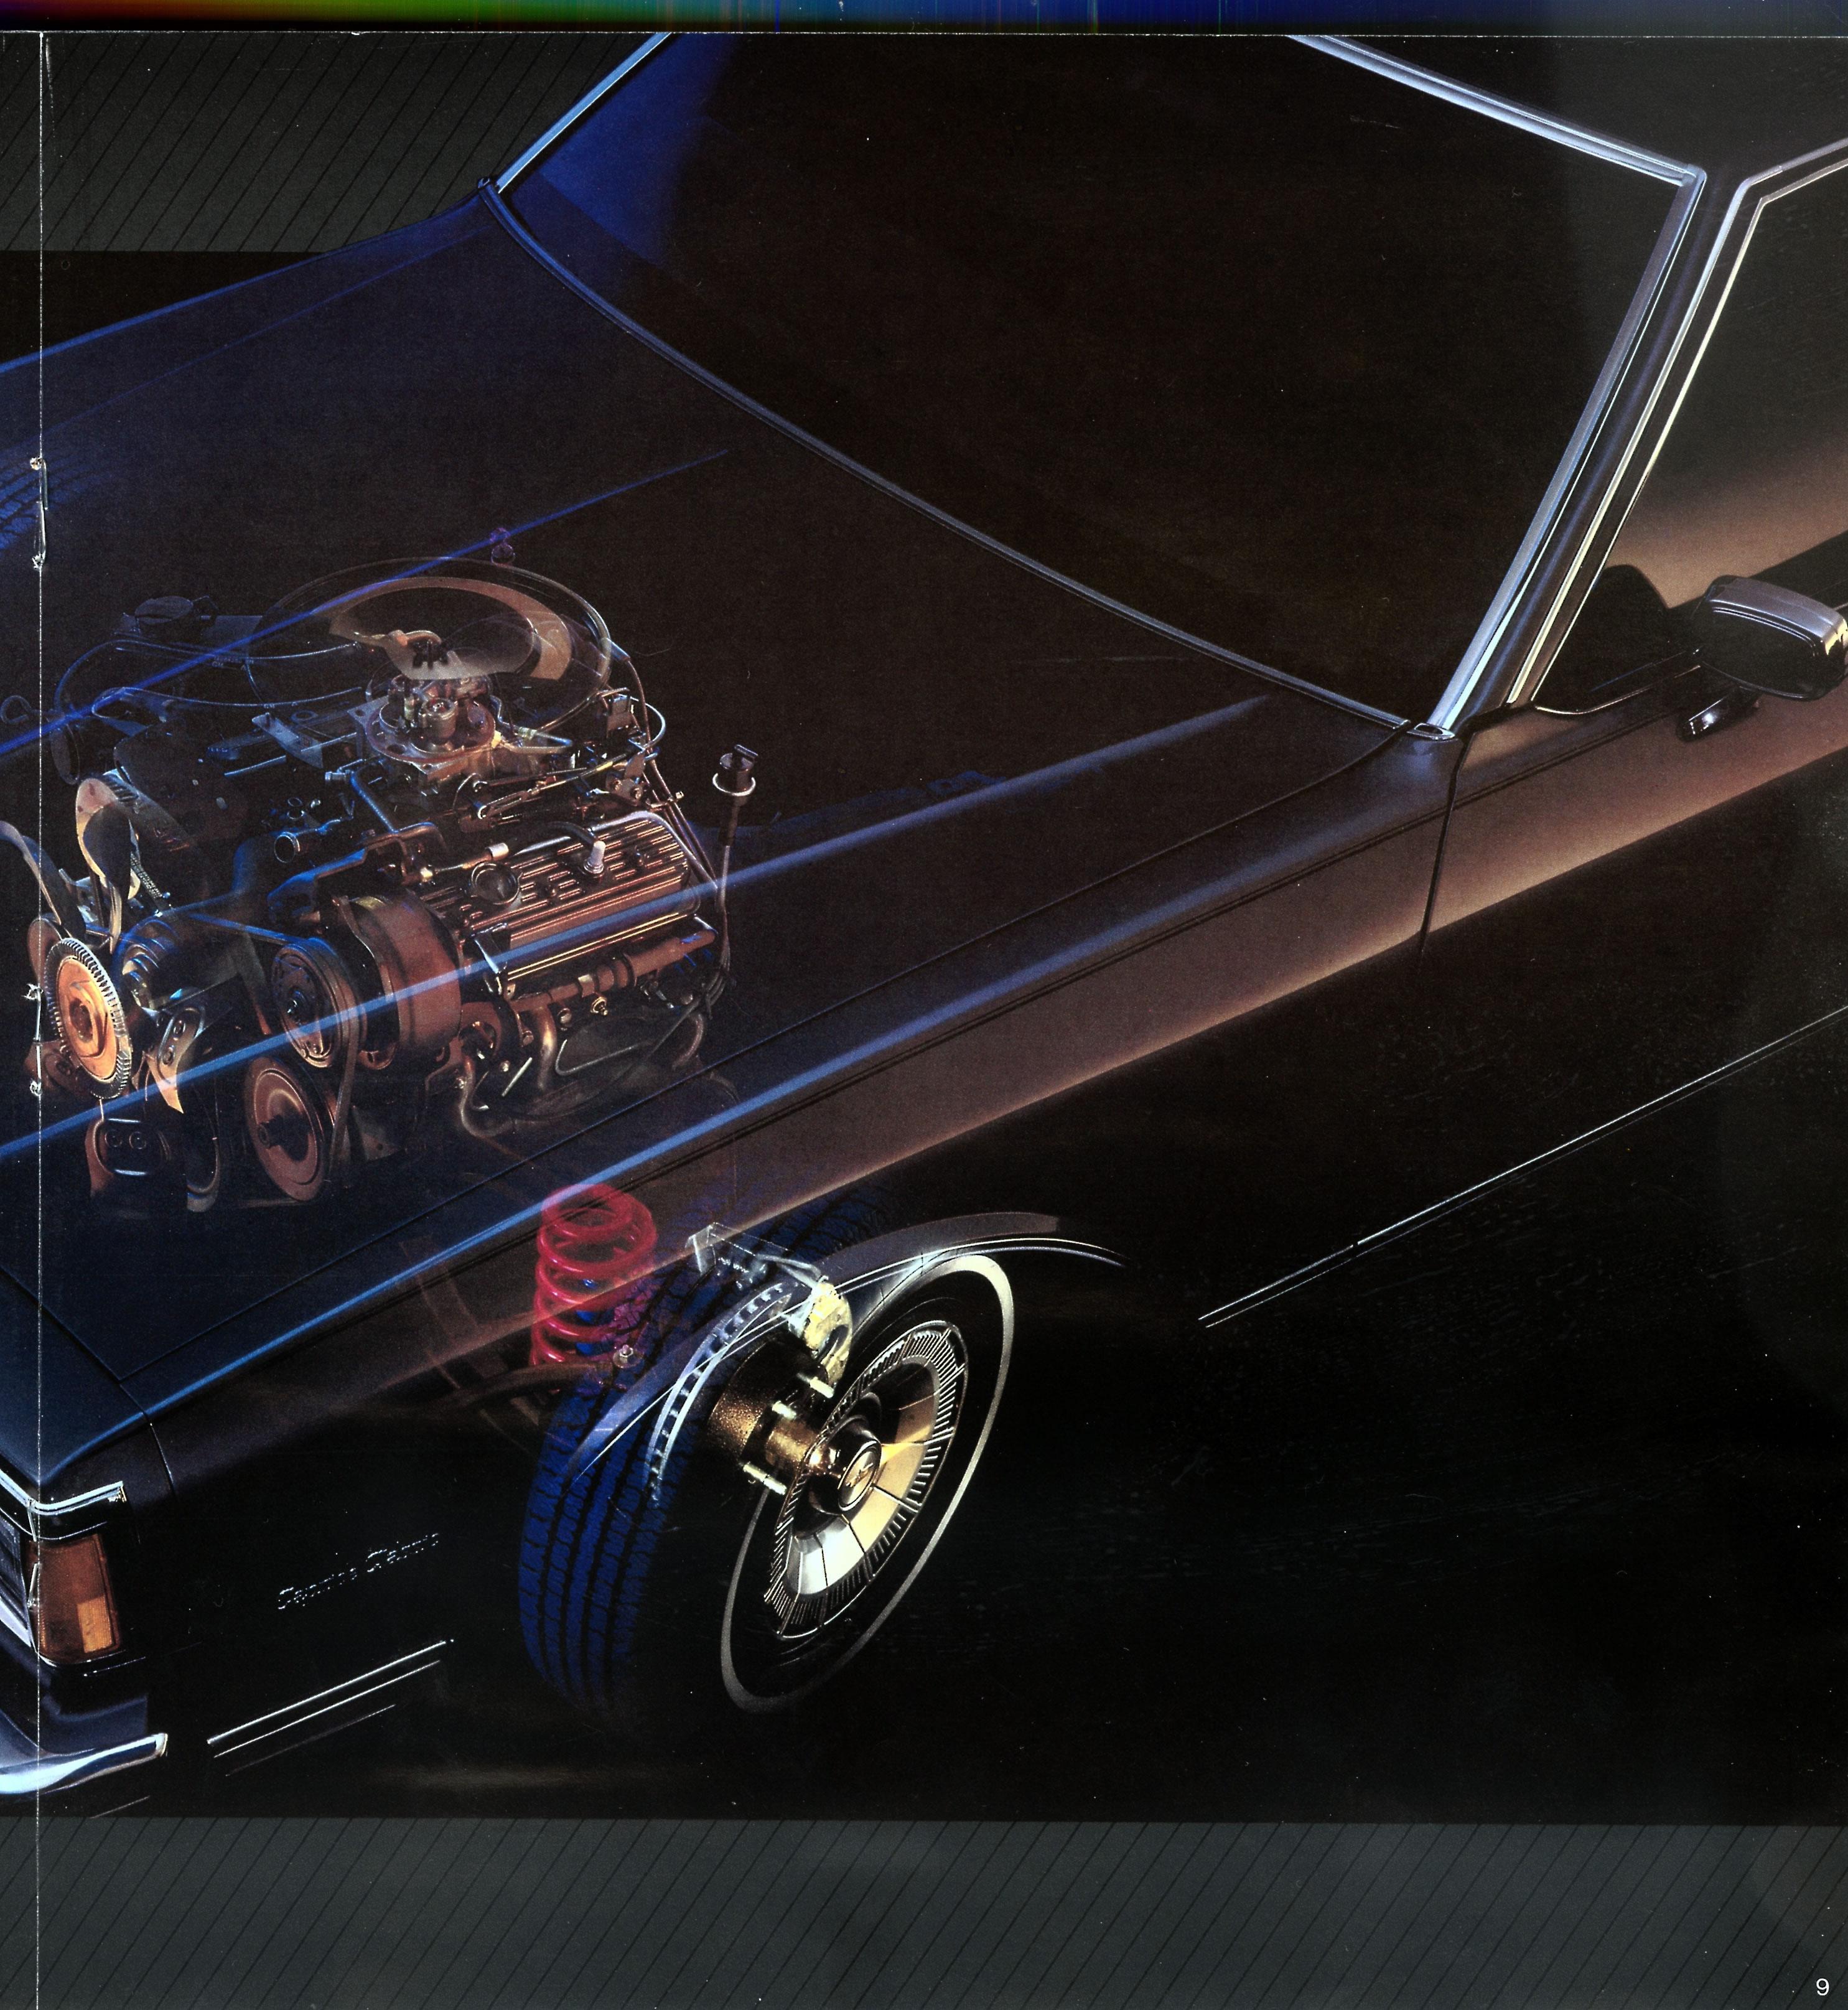 1985 Chevrolet Caprice Brochure / Image12.jpg